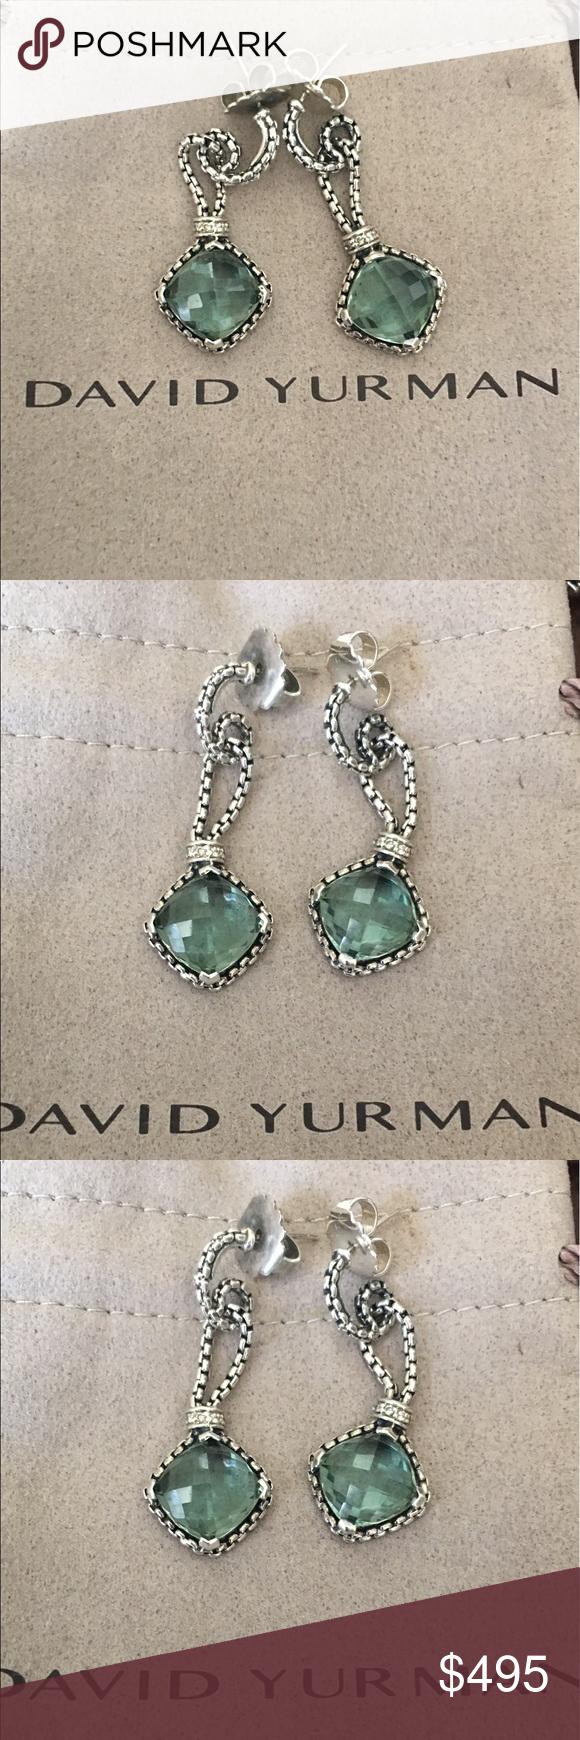 David Yurman Dangle Drop Prasiolite Earrings Cushion On Point